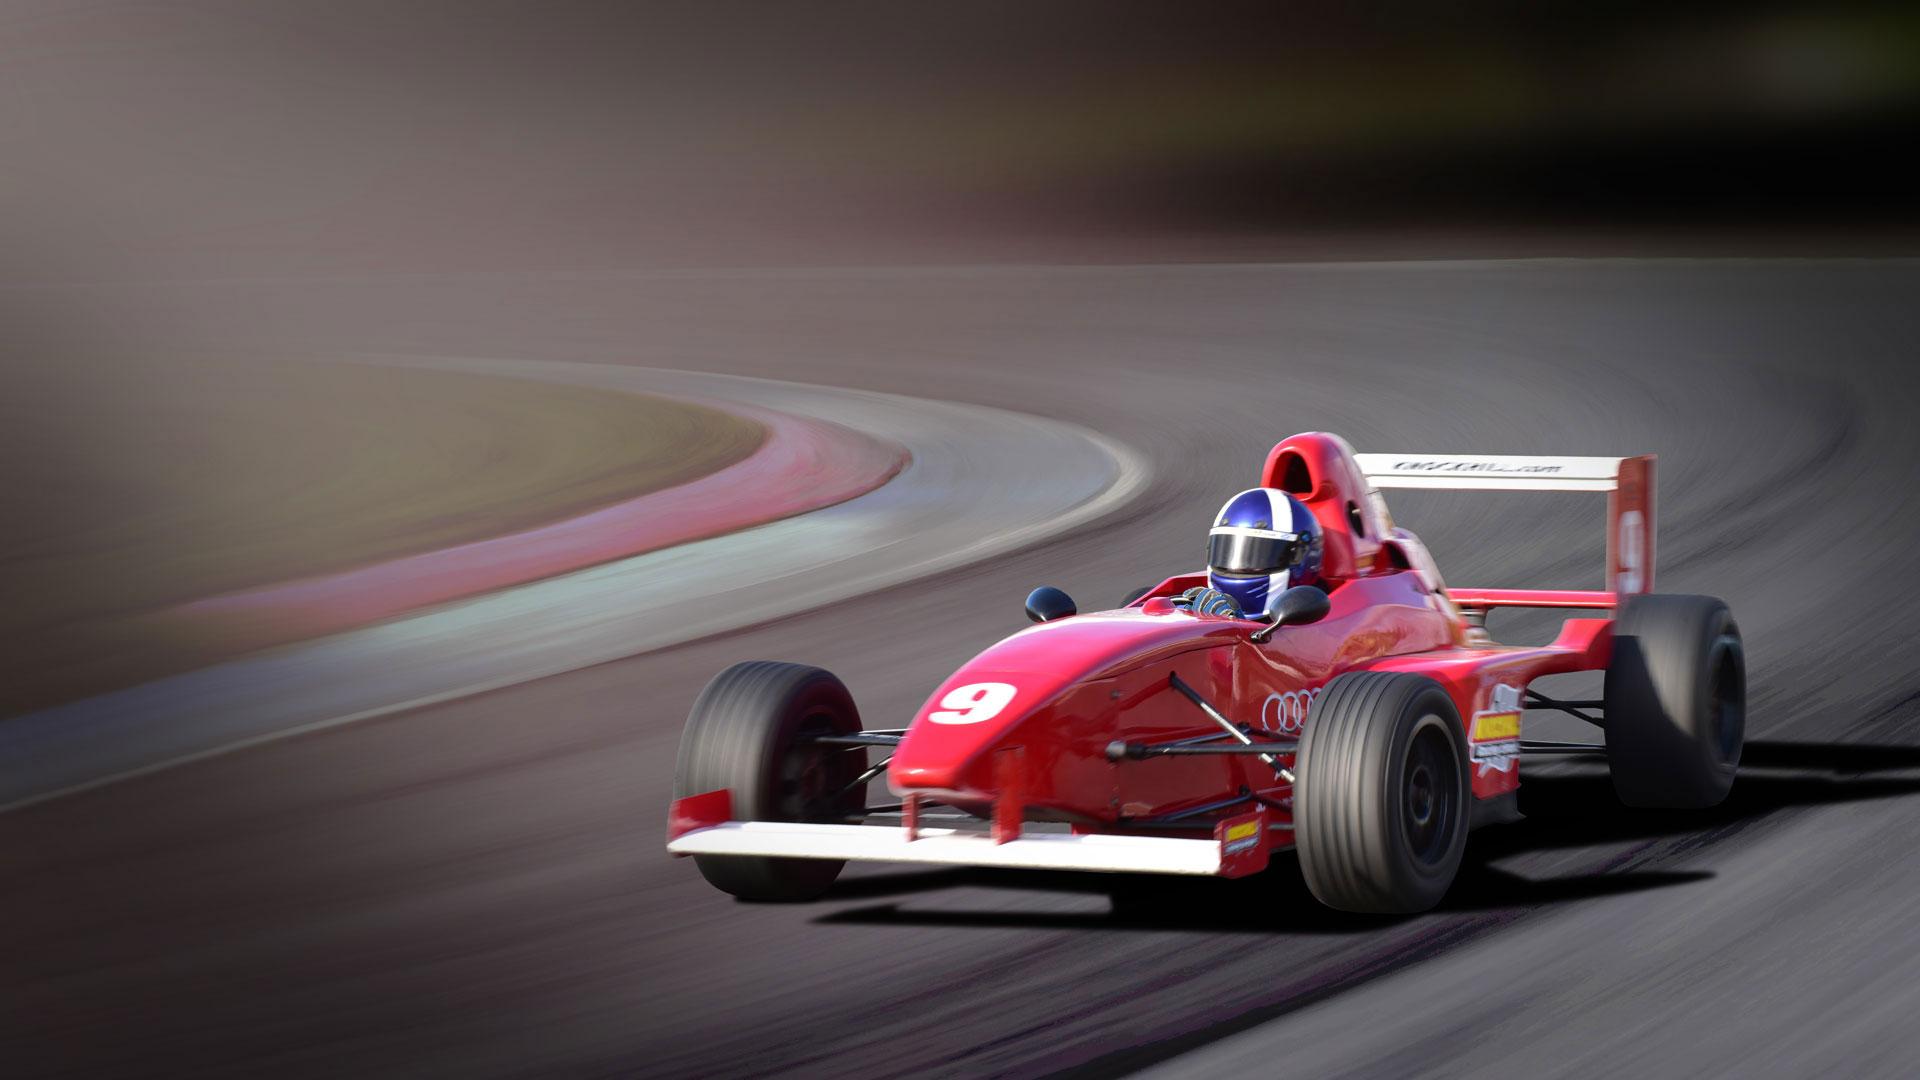 Formula Race Car Experience | Drive a Formula Race Car at